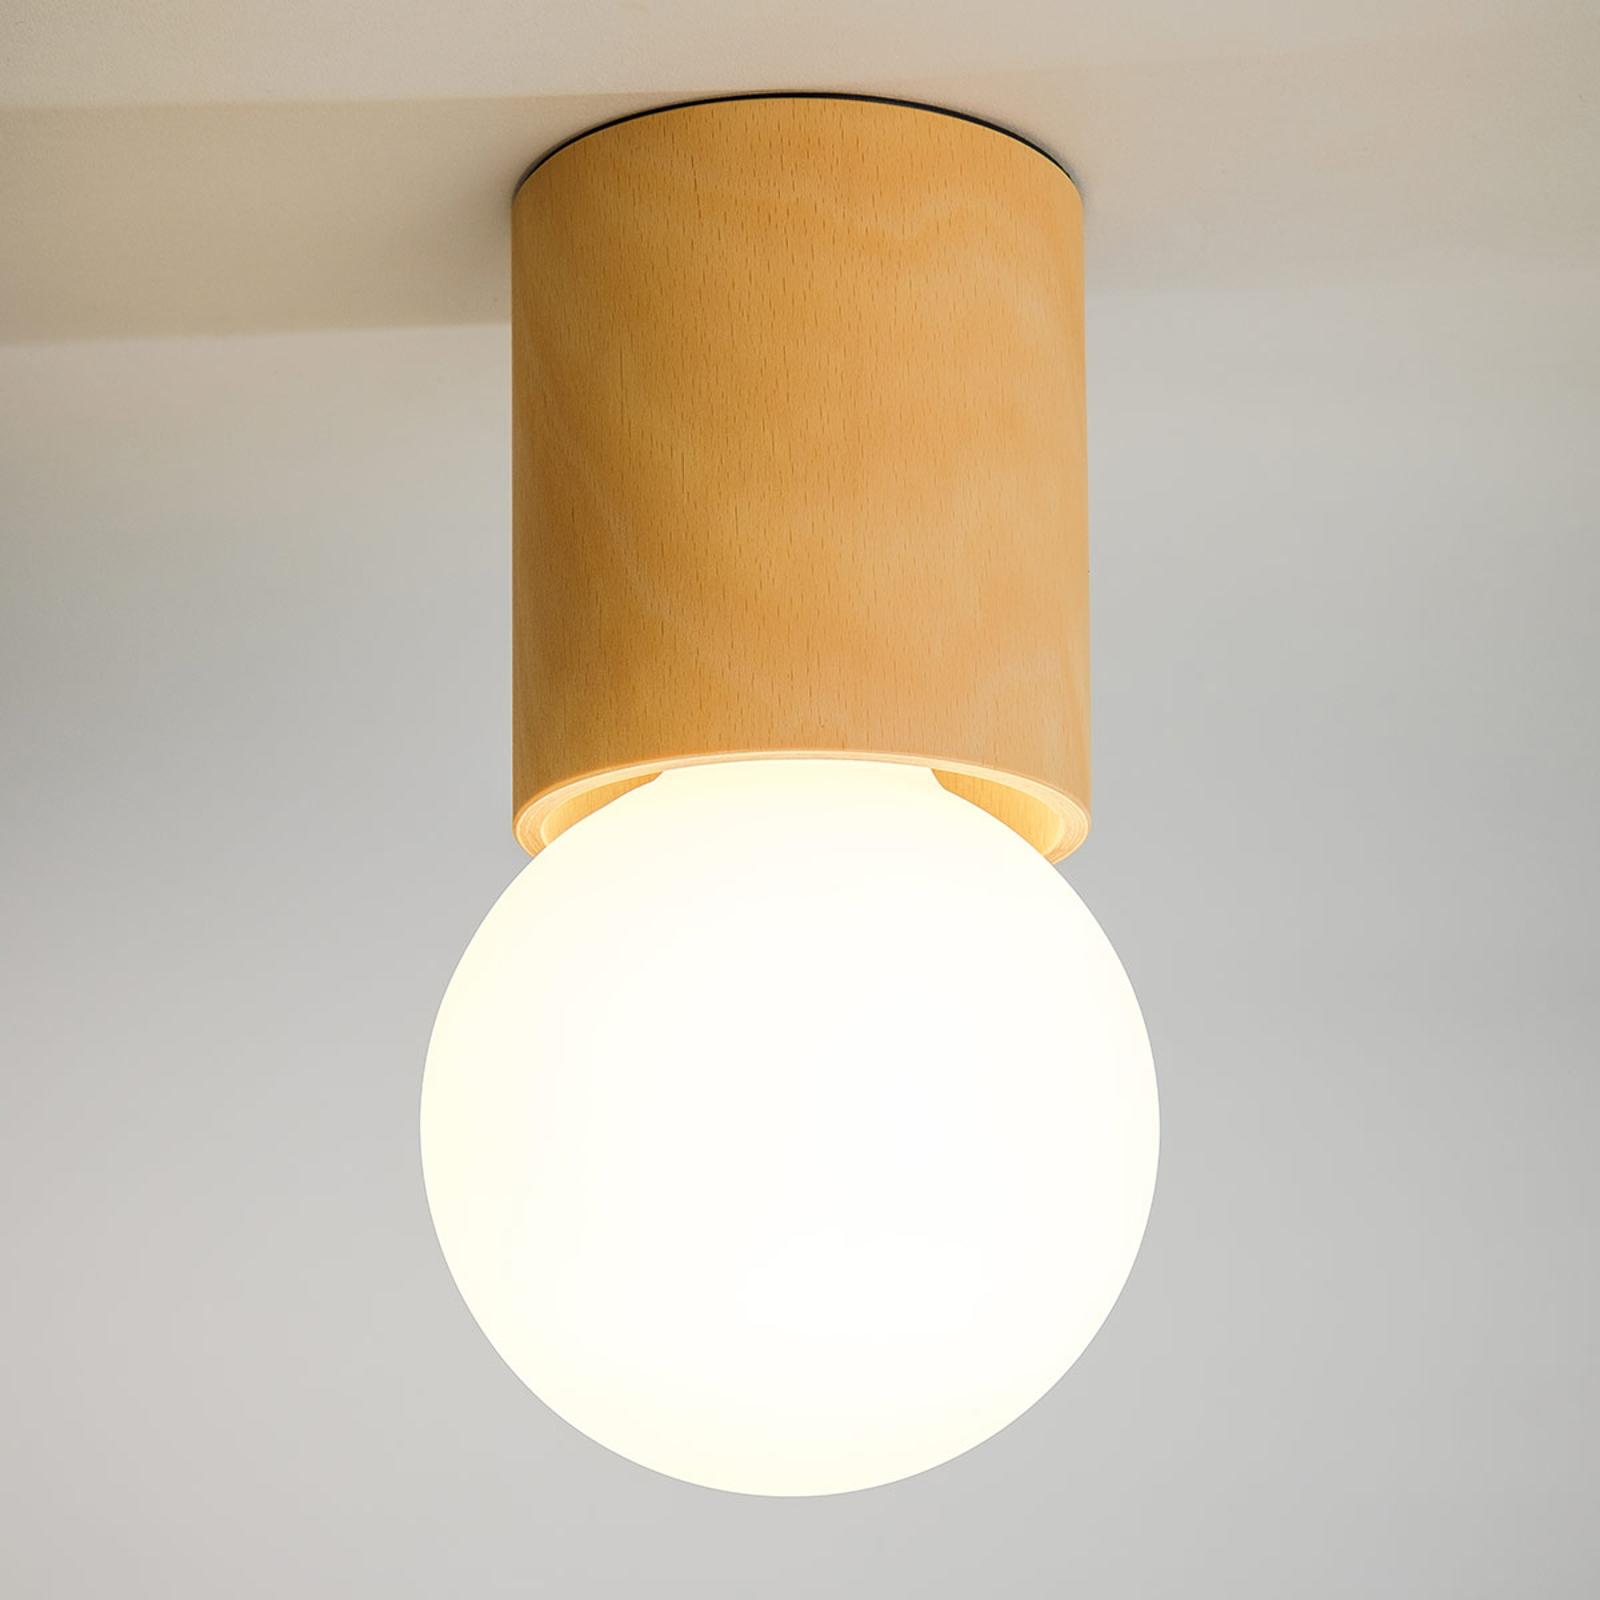 Lampa sufitowa Tondolo, drewno bukowe